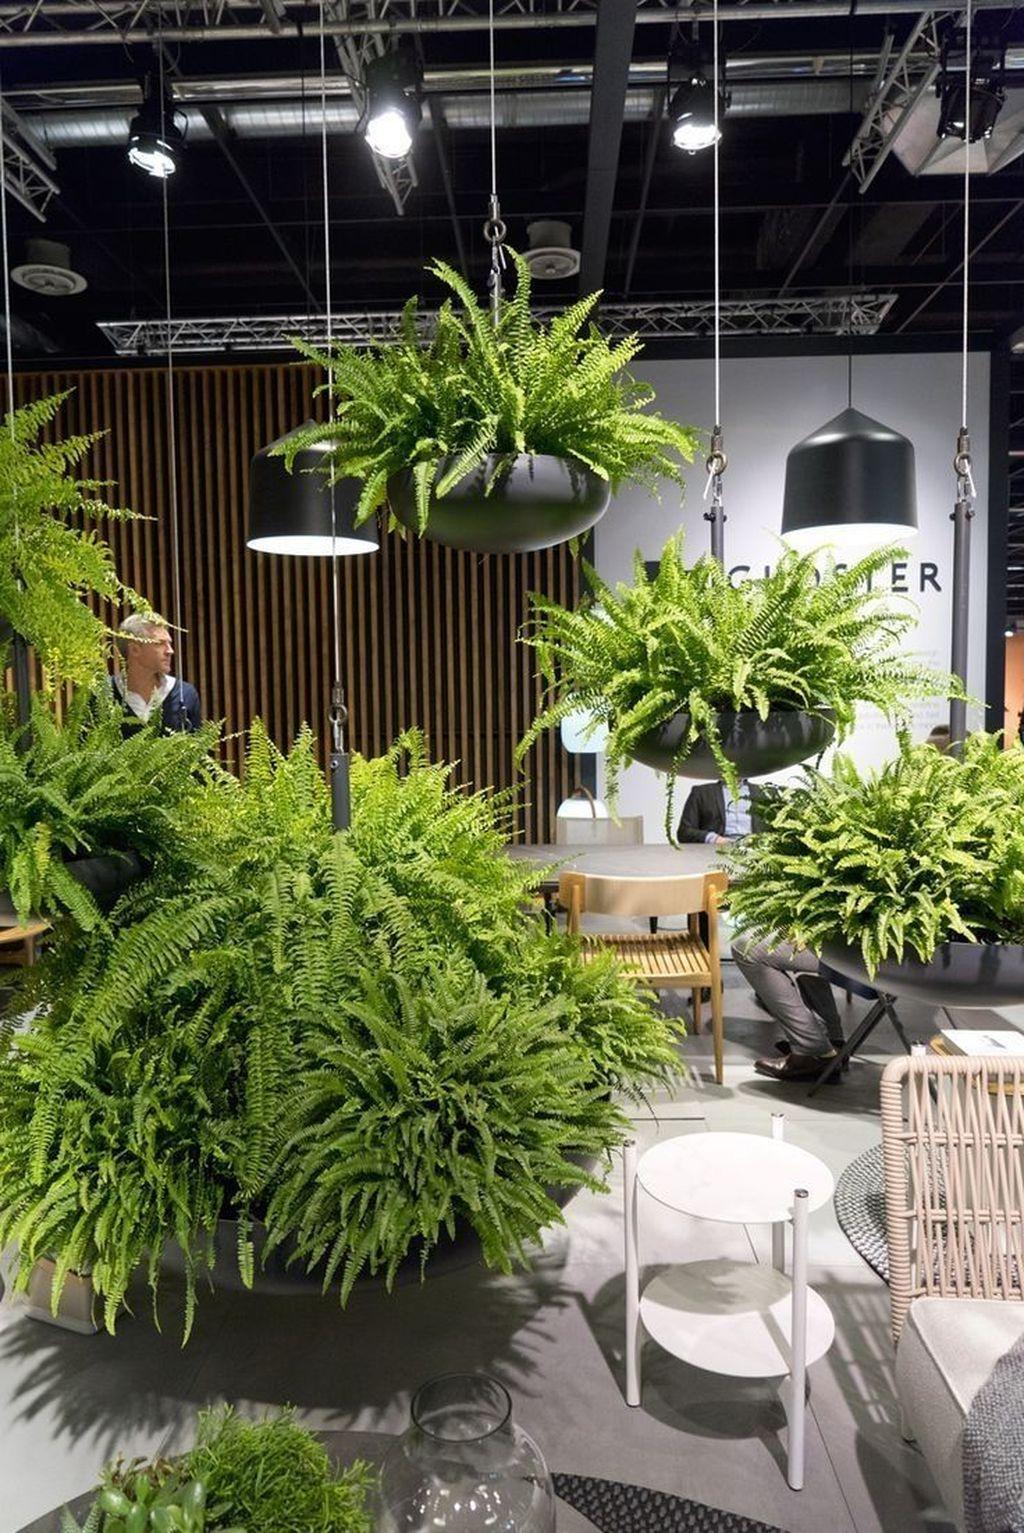 40 Dreamy Hanging Plants Ideas For Best Home Décor